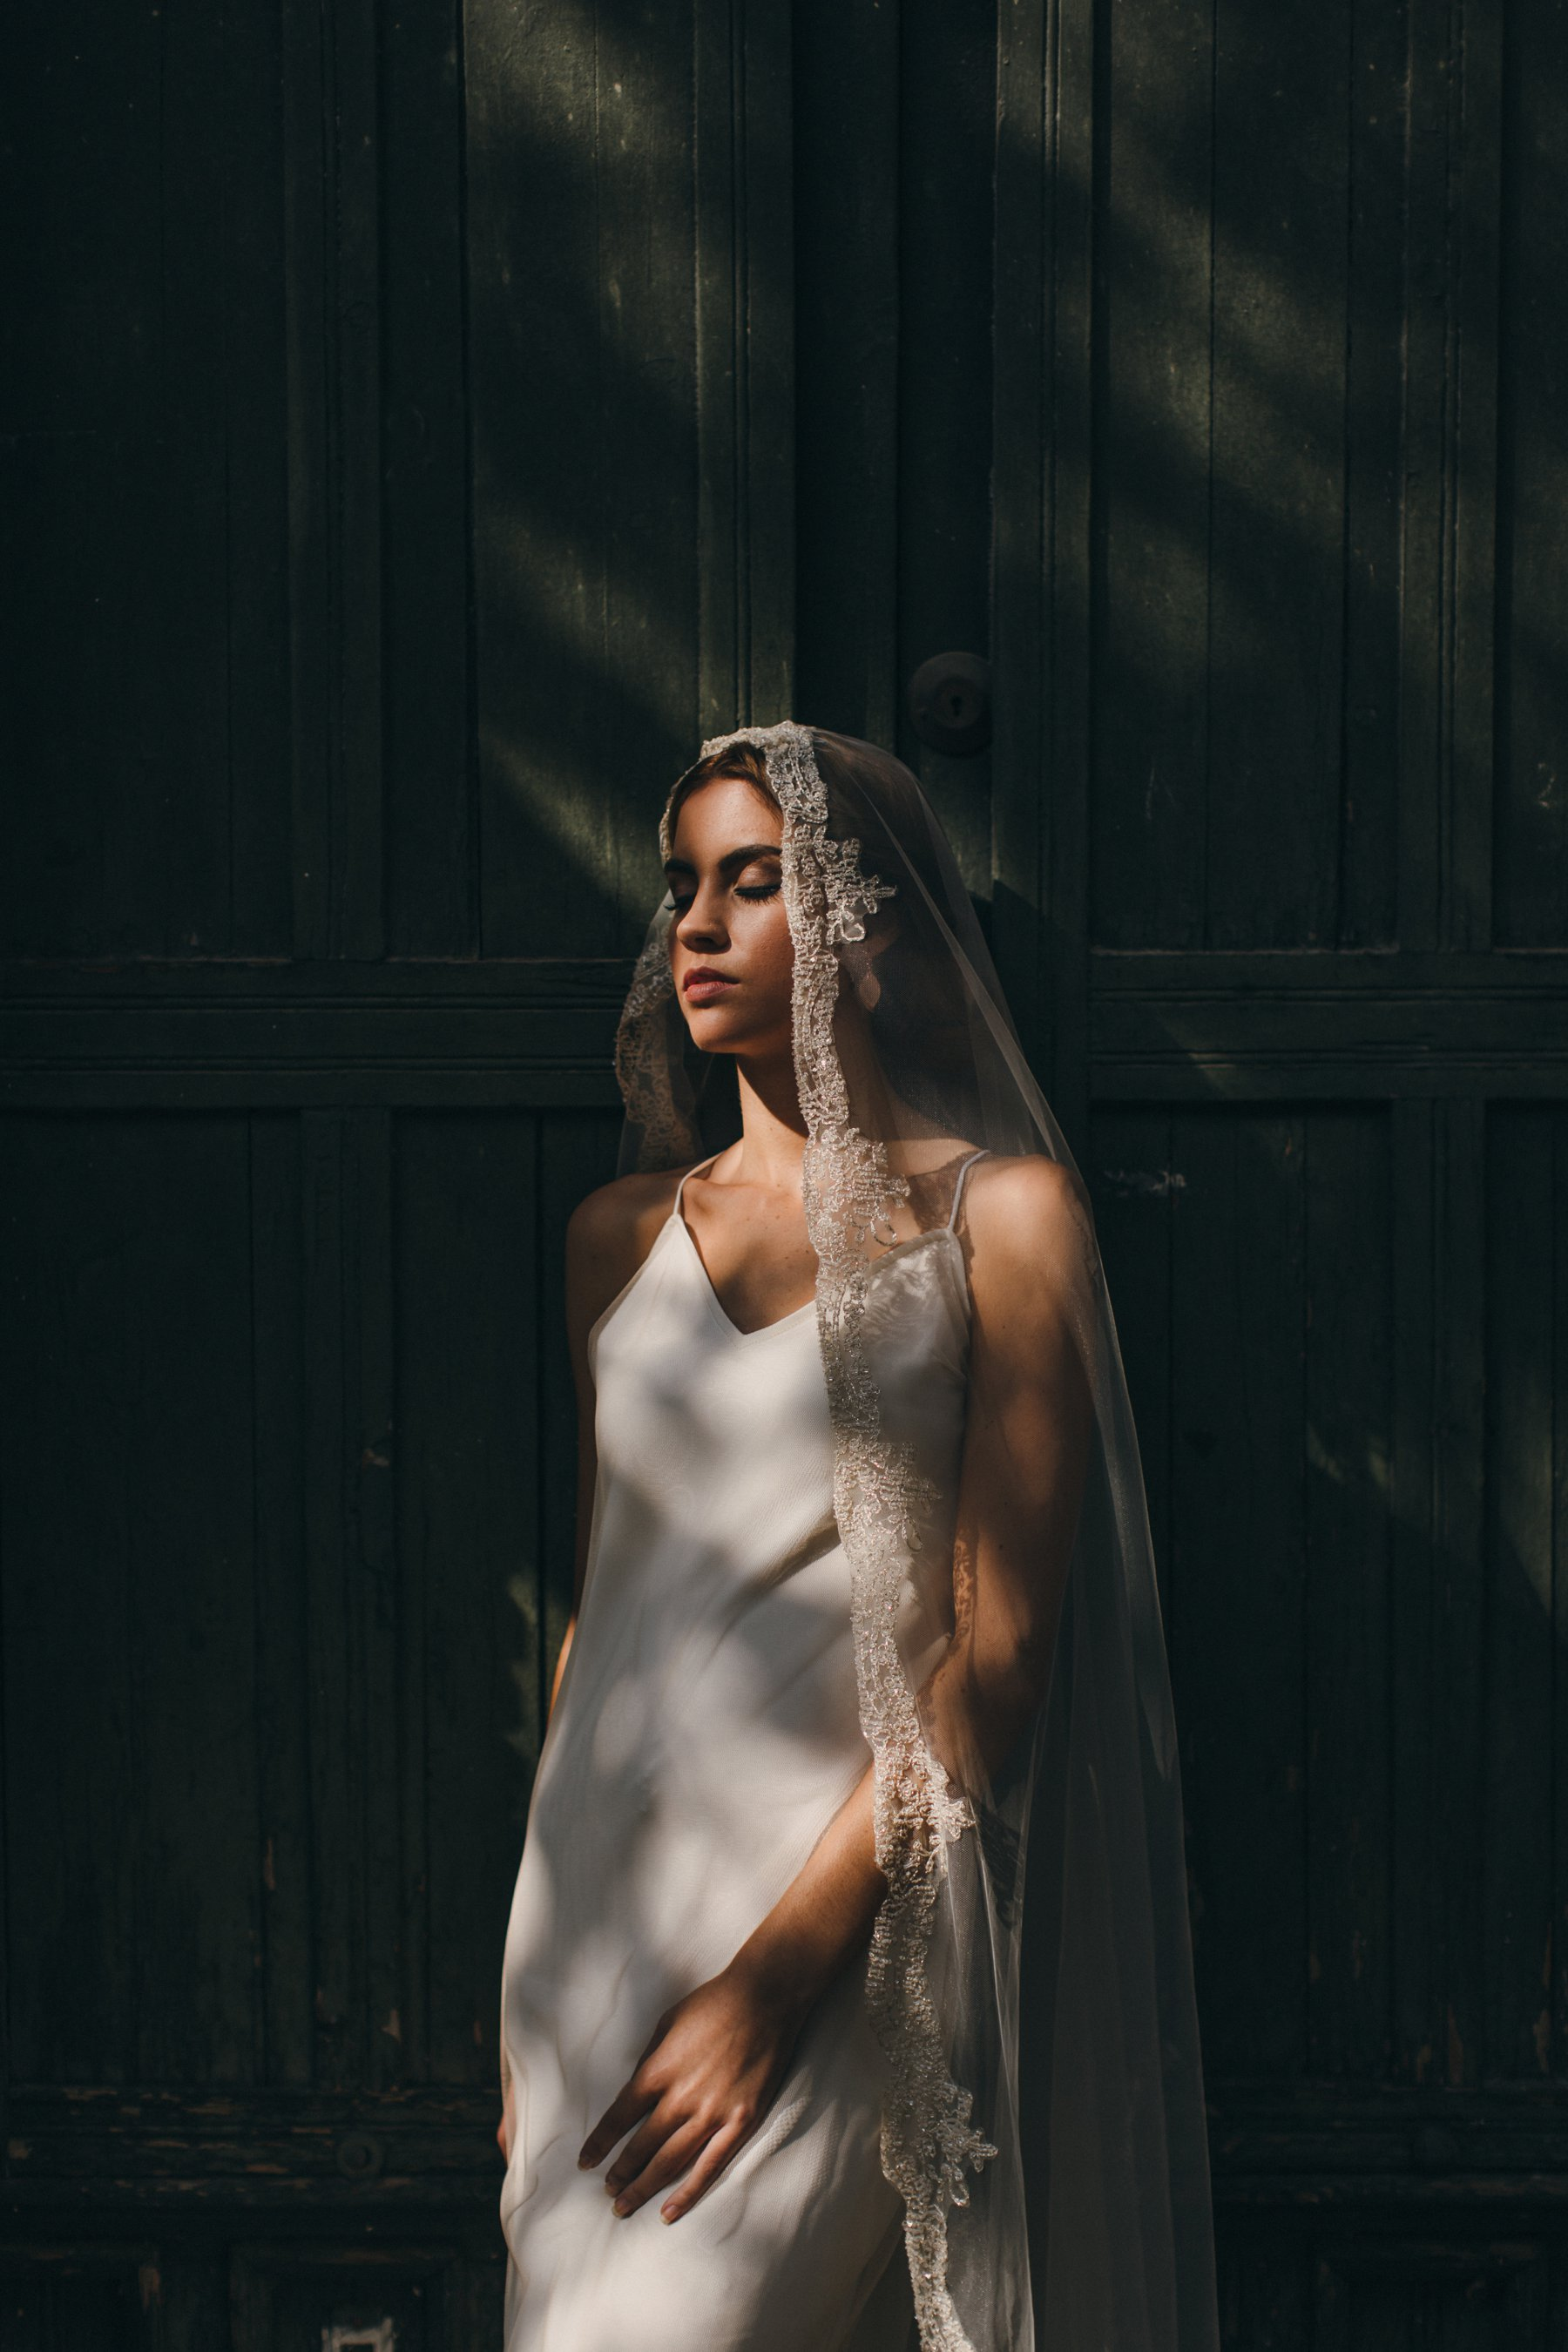 deanesatqueenswedding_paulaohara_0070